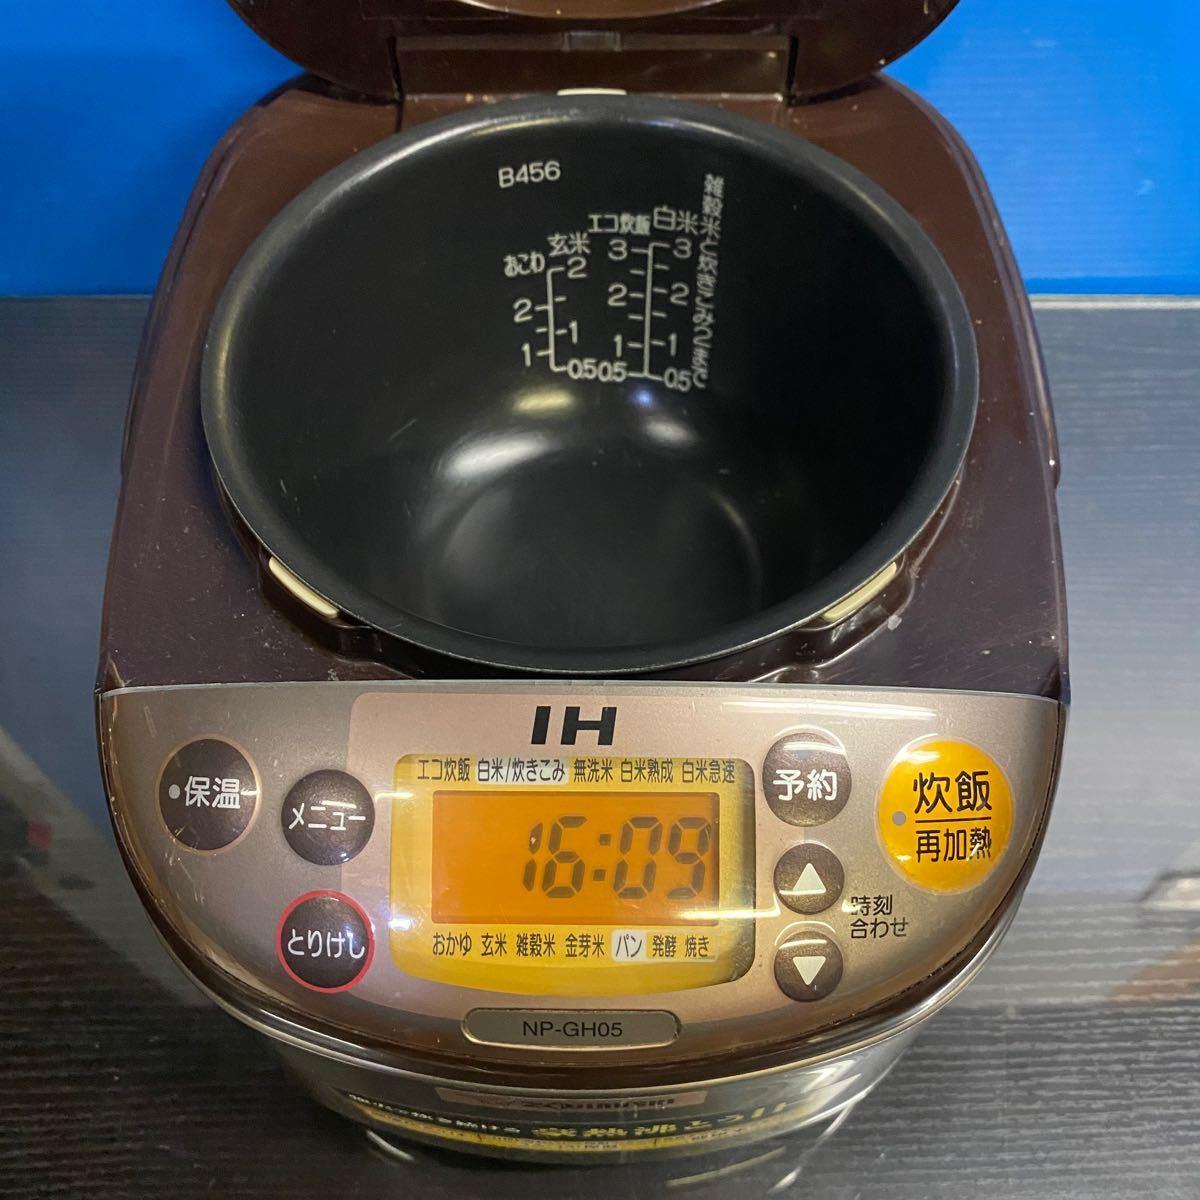 ☆象印 IH炊飯器3合炊き NP-GH05型 18年製